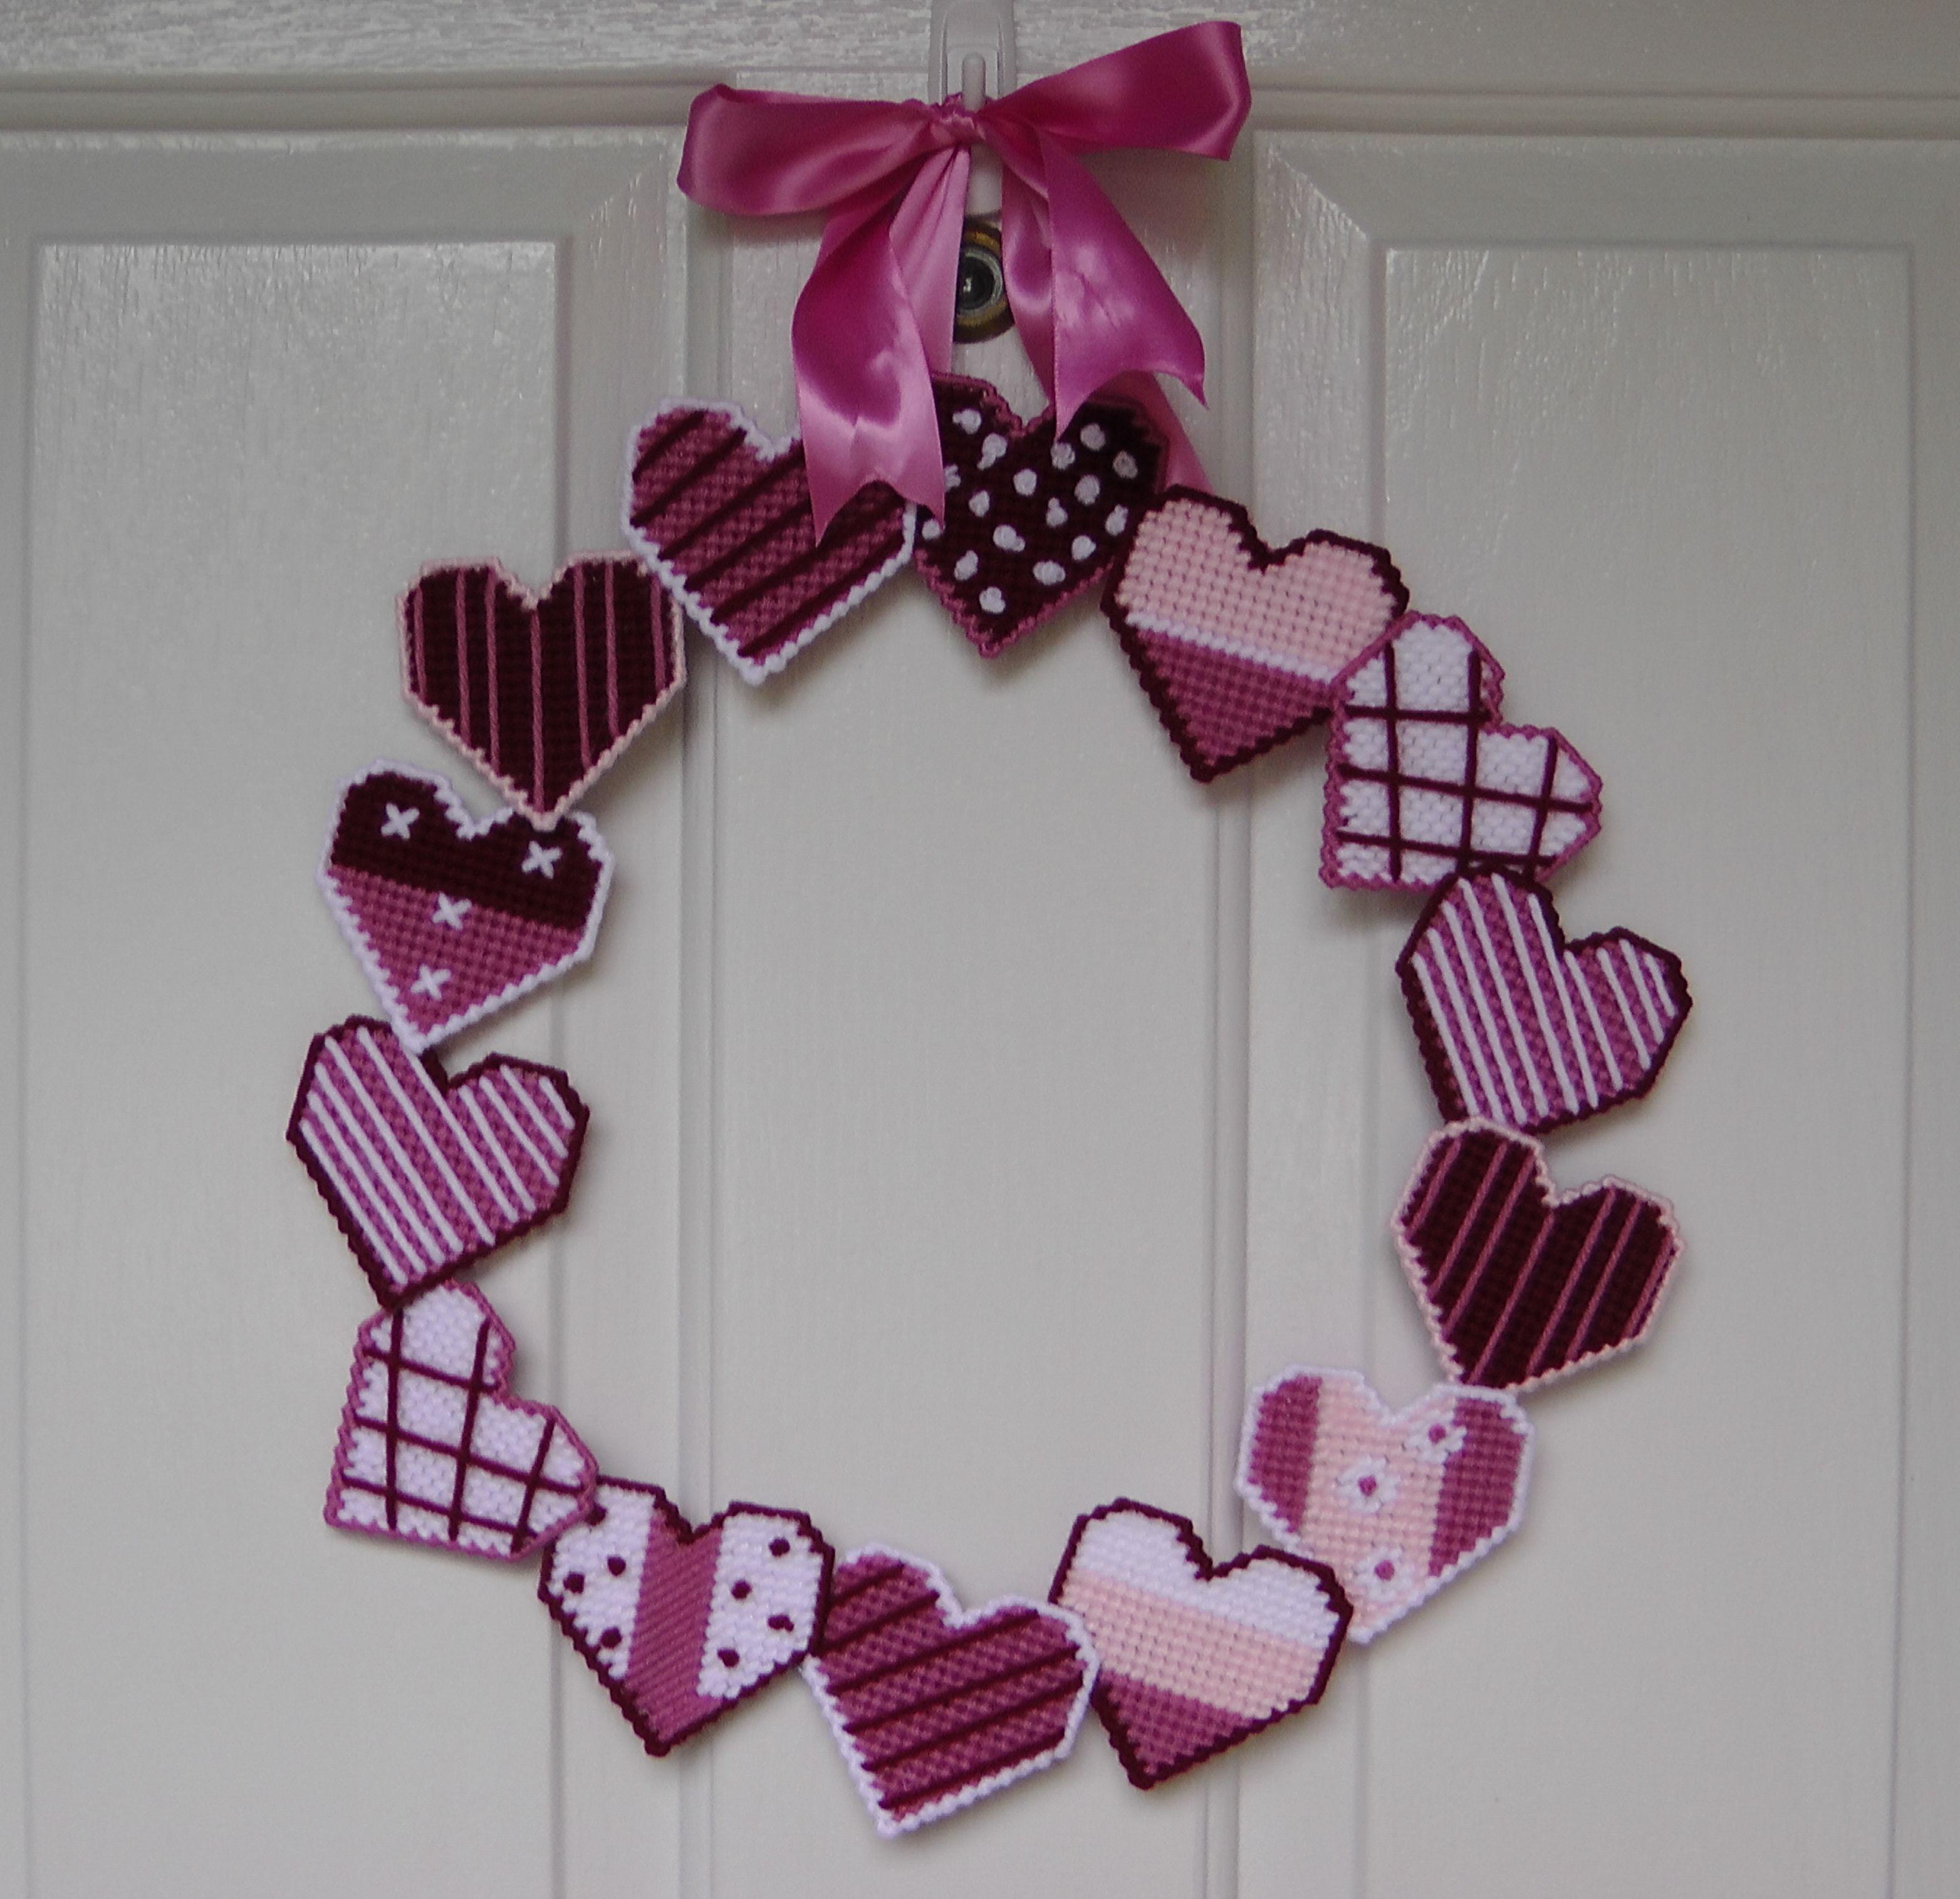 San Valentin Decoration Corona Con Corazones Para San Valentin Plastic Canvas Visitame